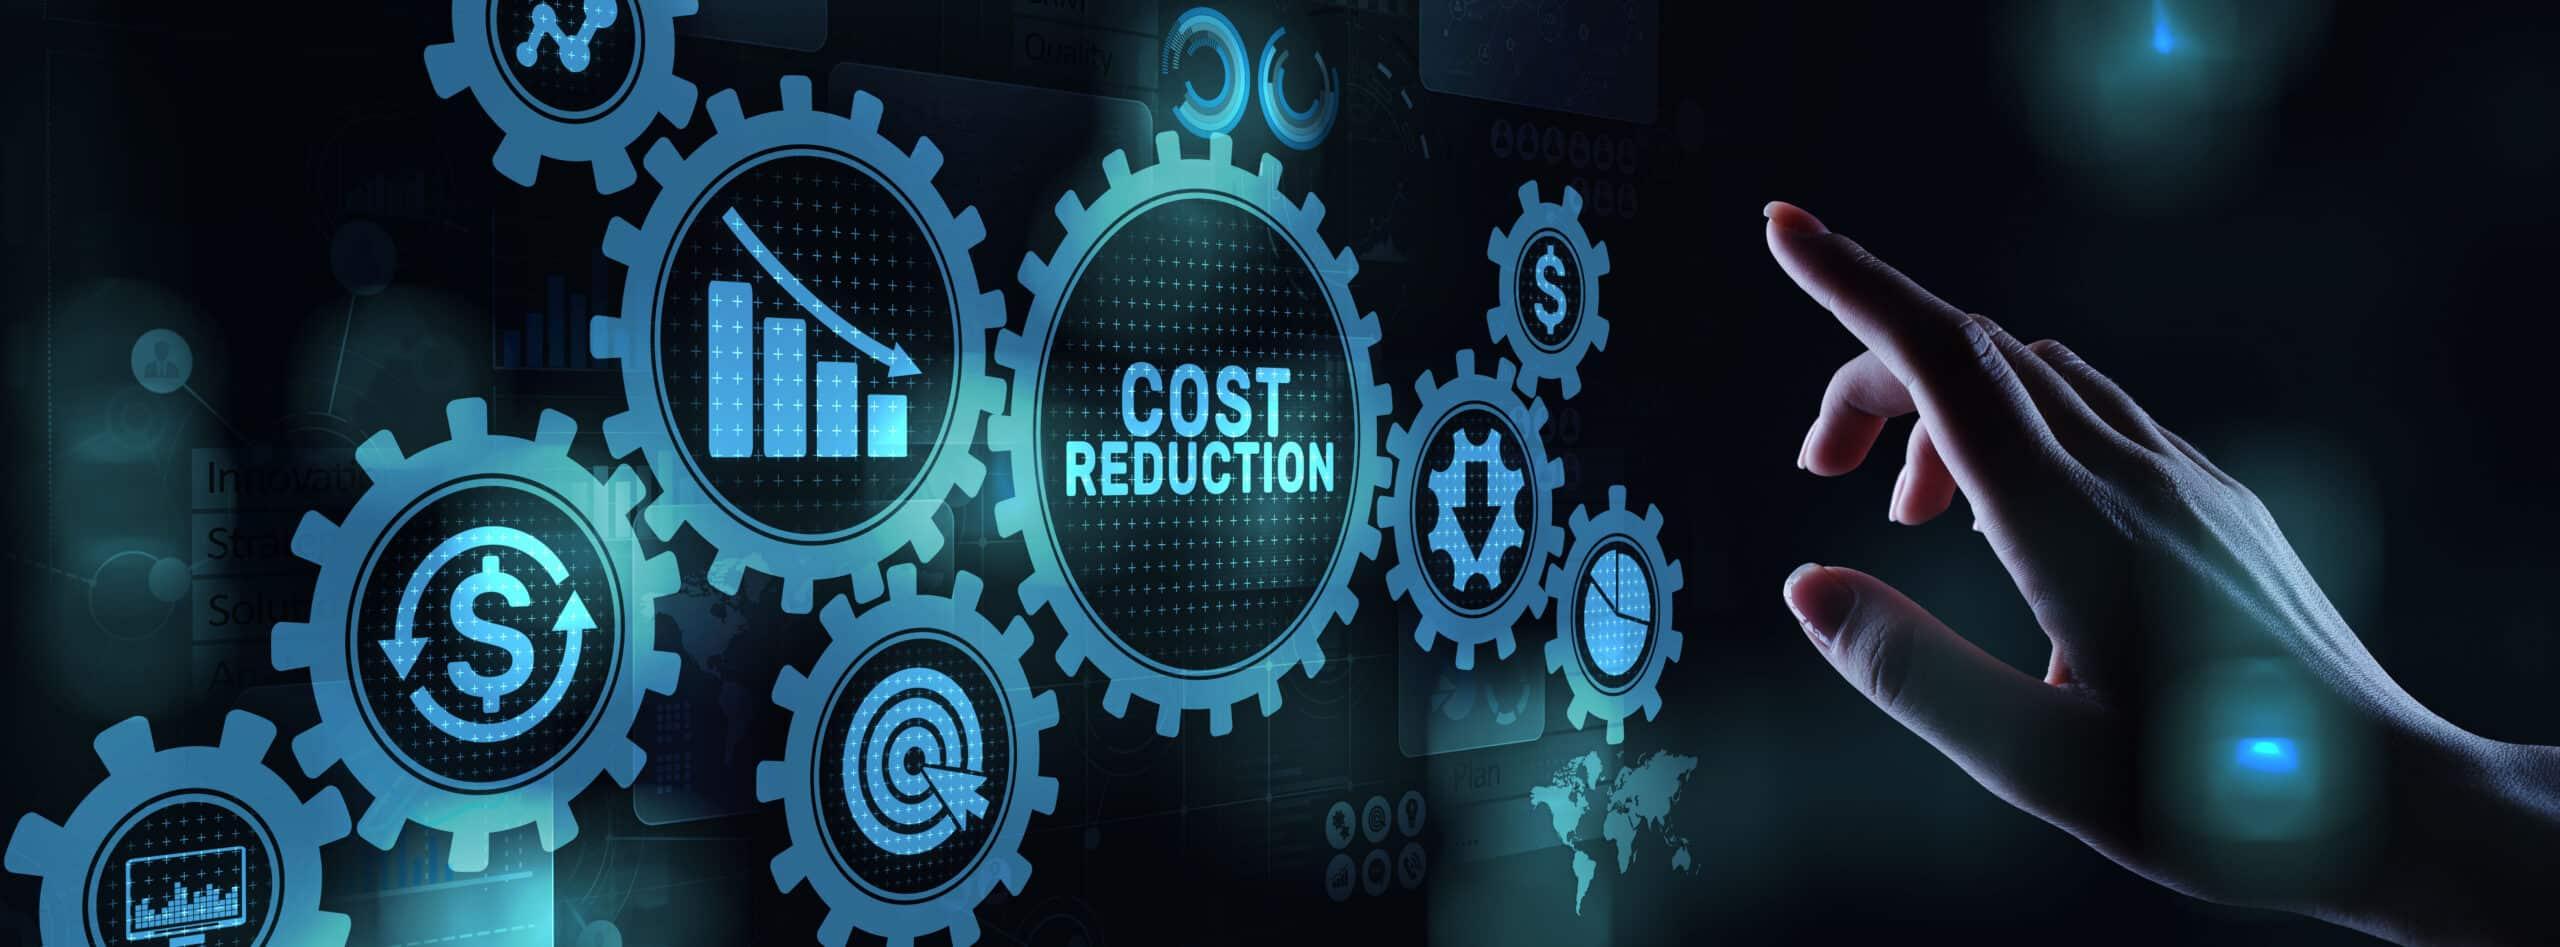 Kostenreduktion